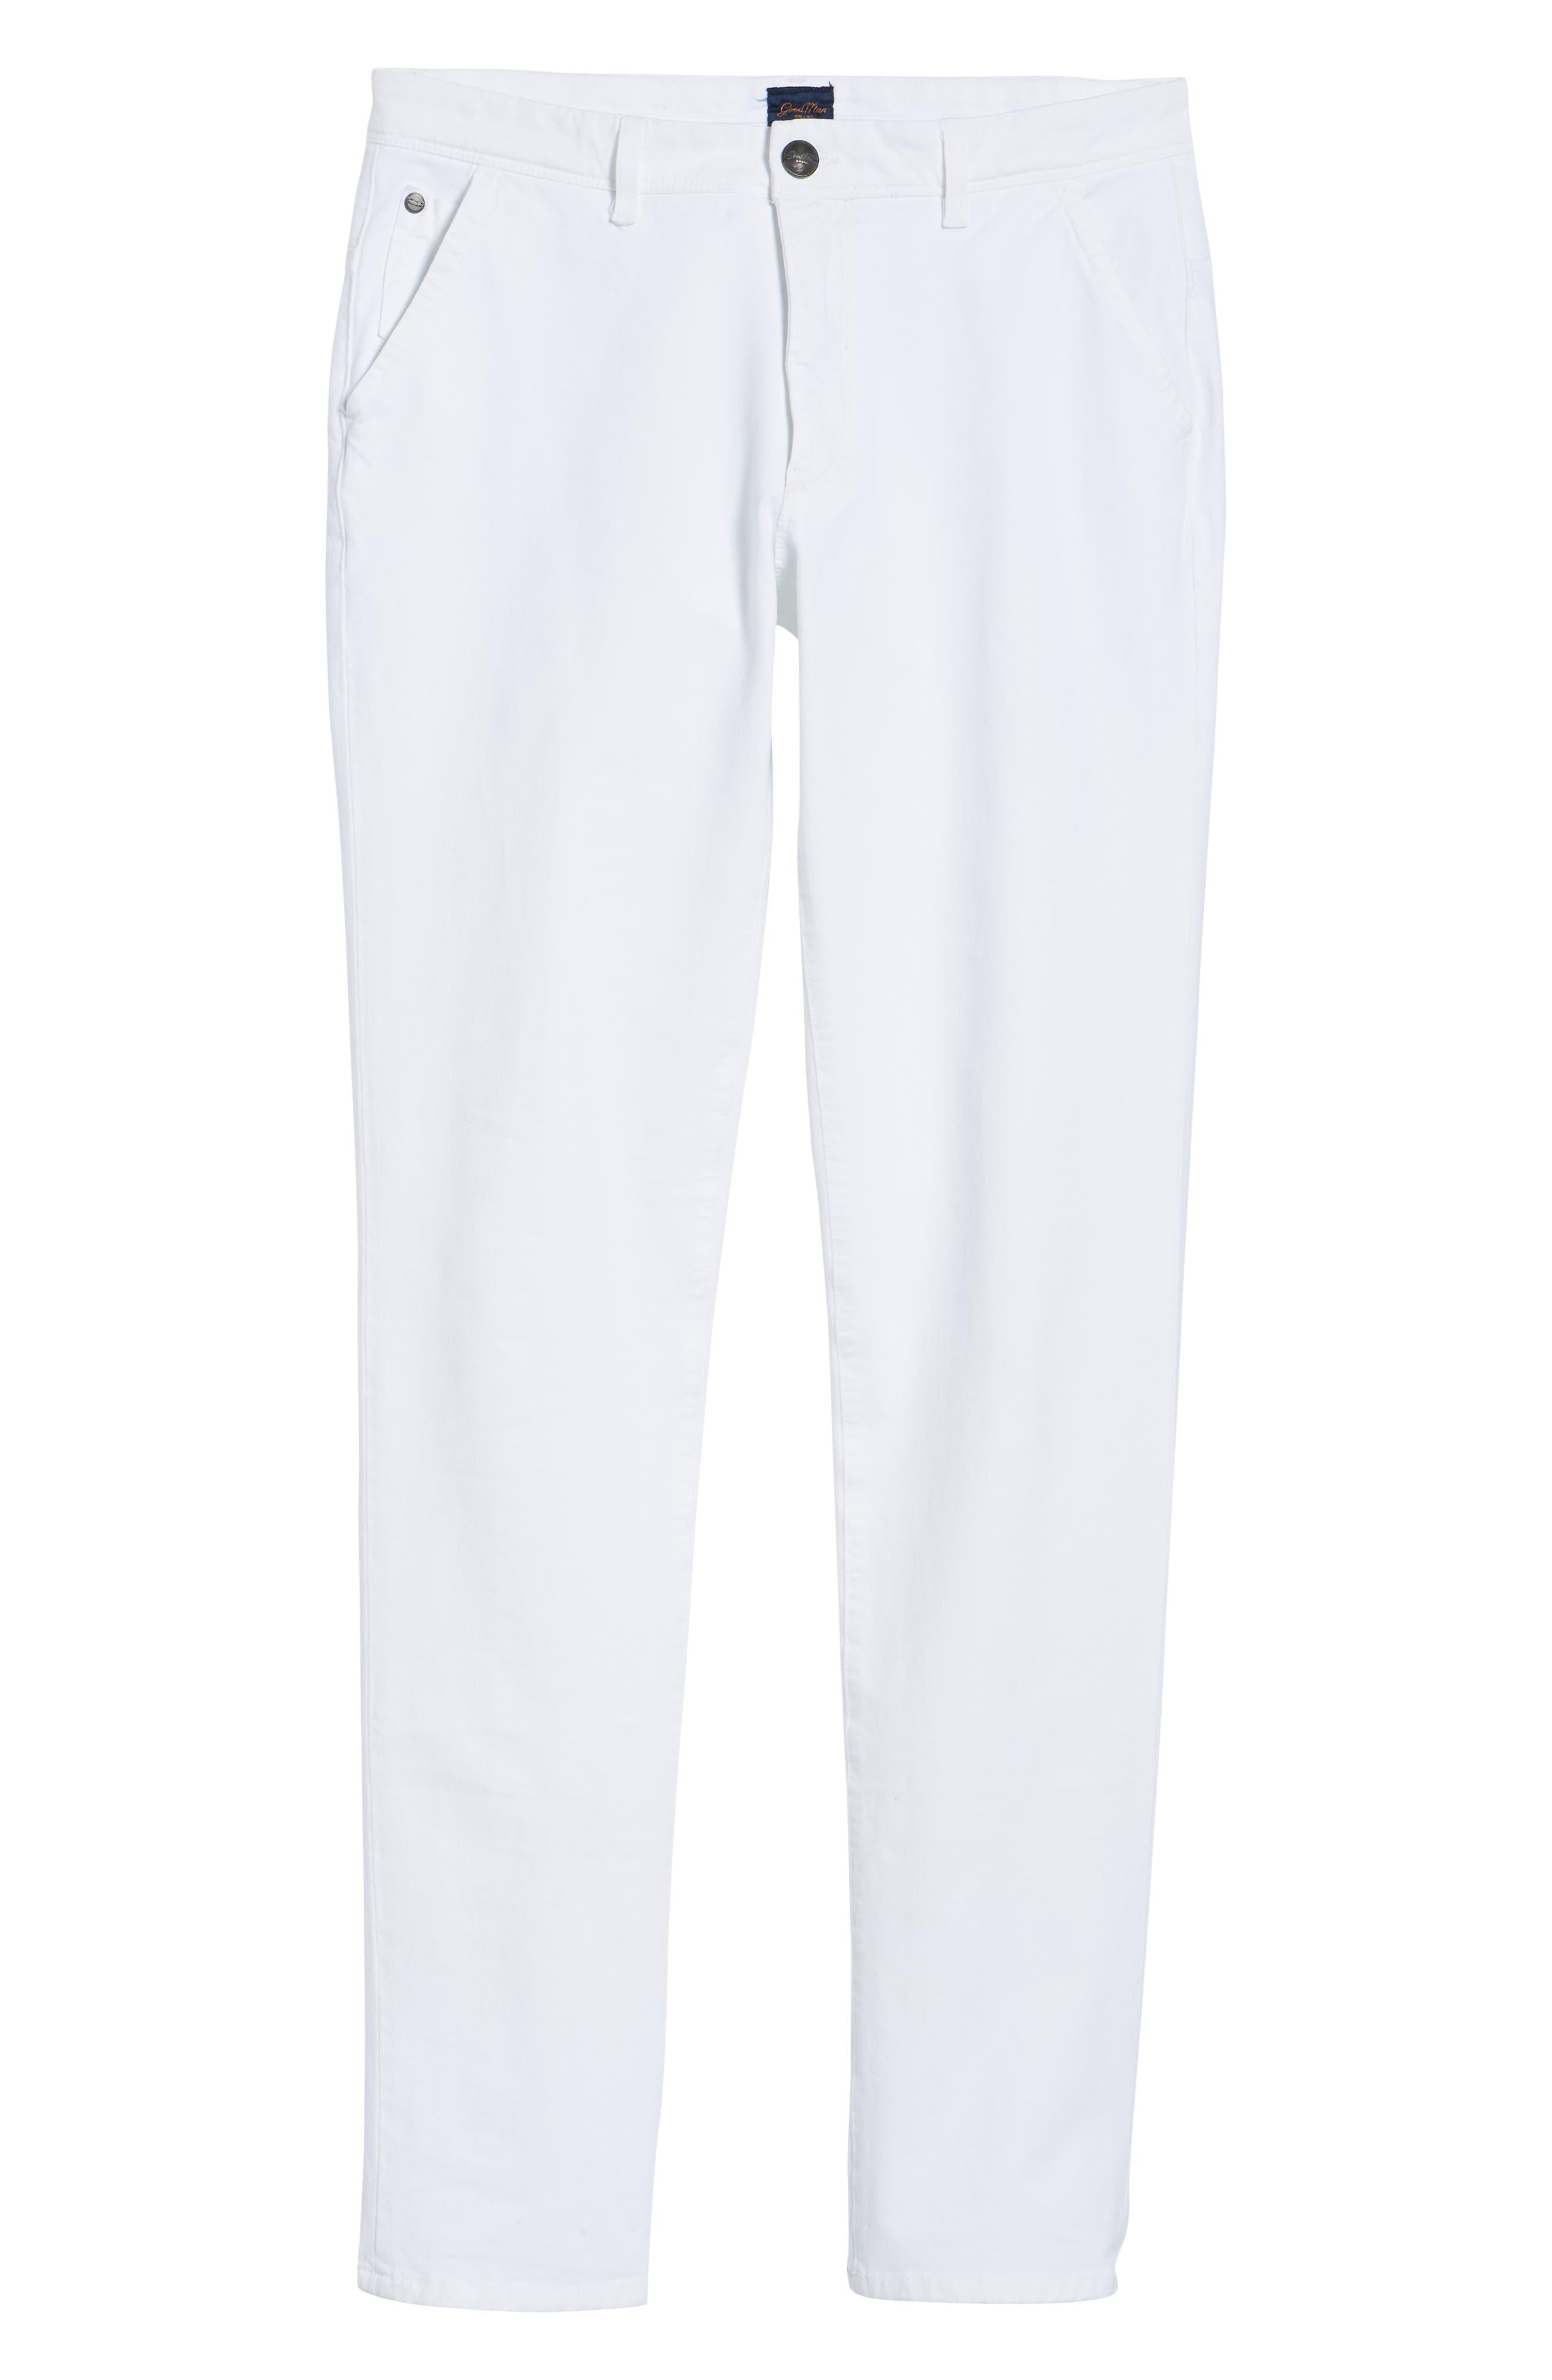 Hybrid Slim Fit Stretch Pants,                             Alternate thumbnail 6, color,                             100